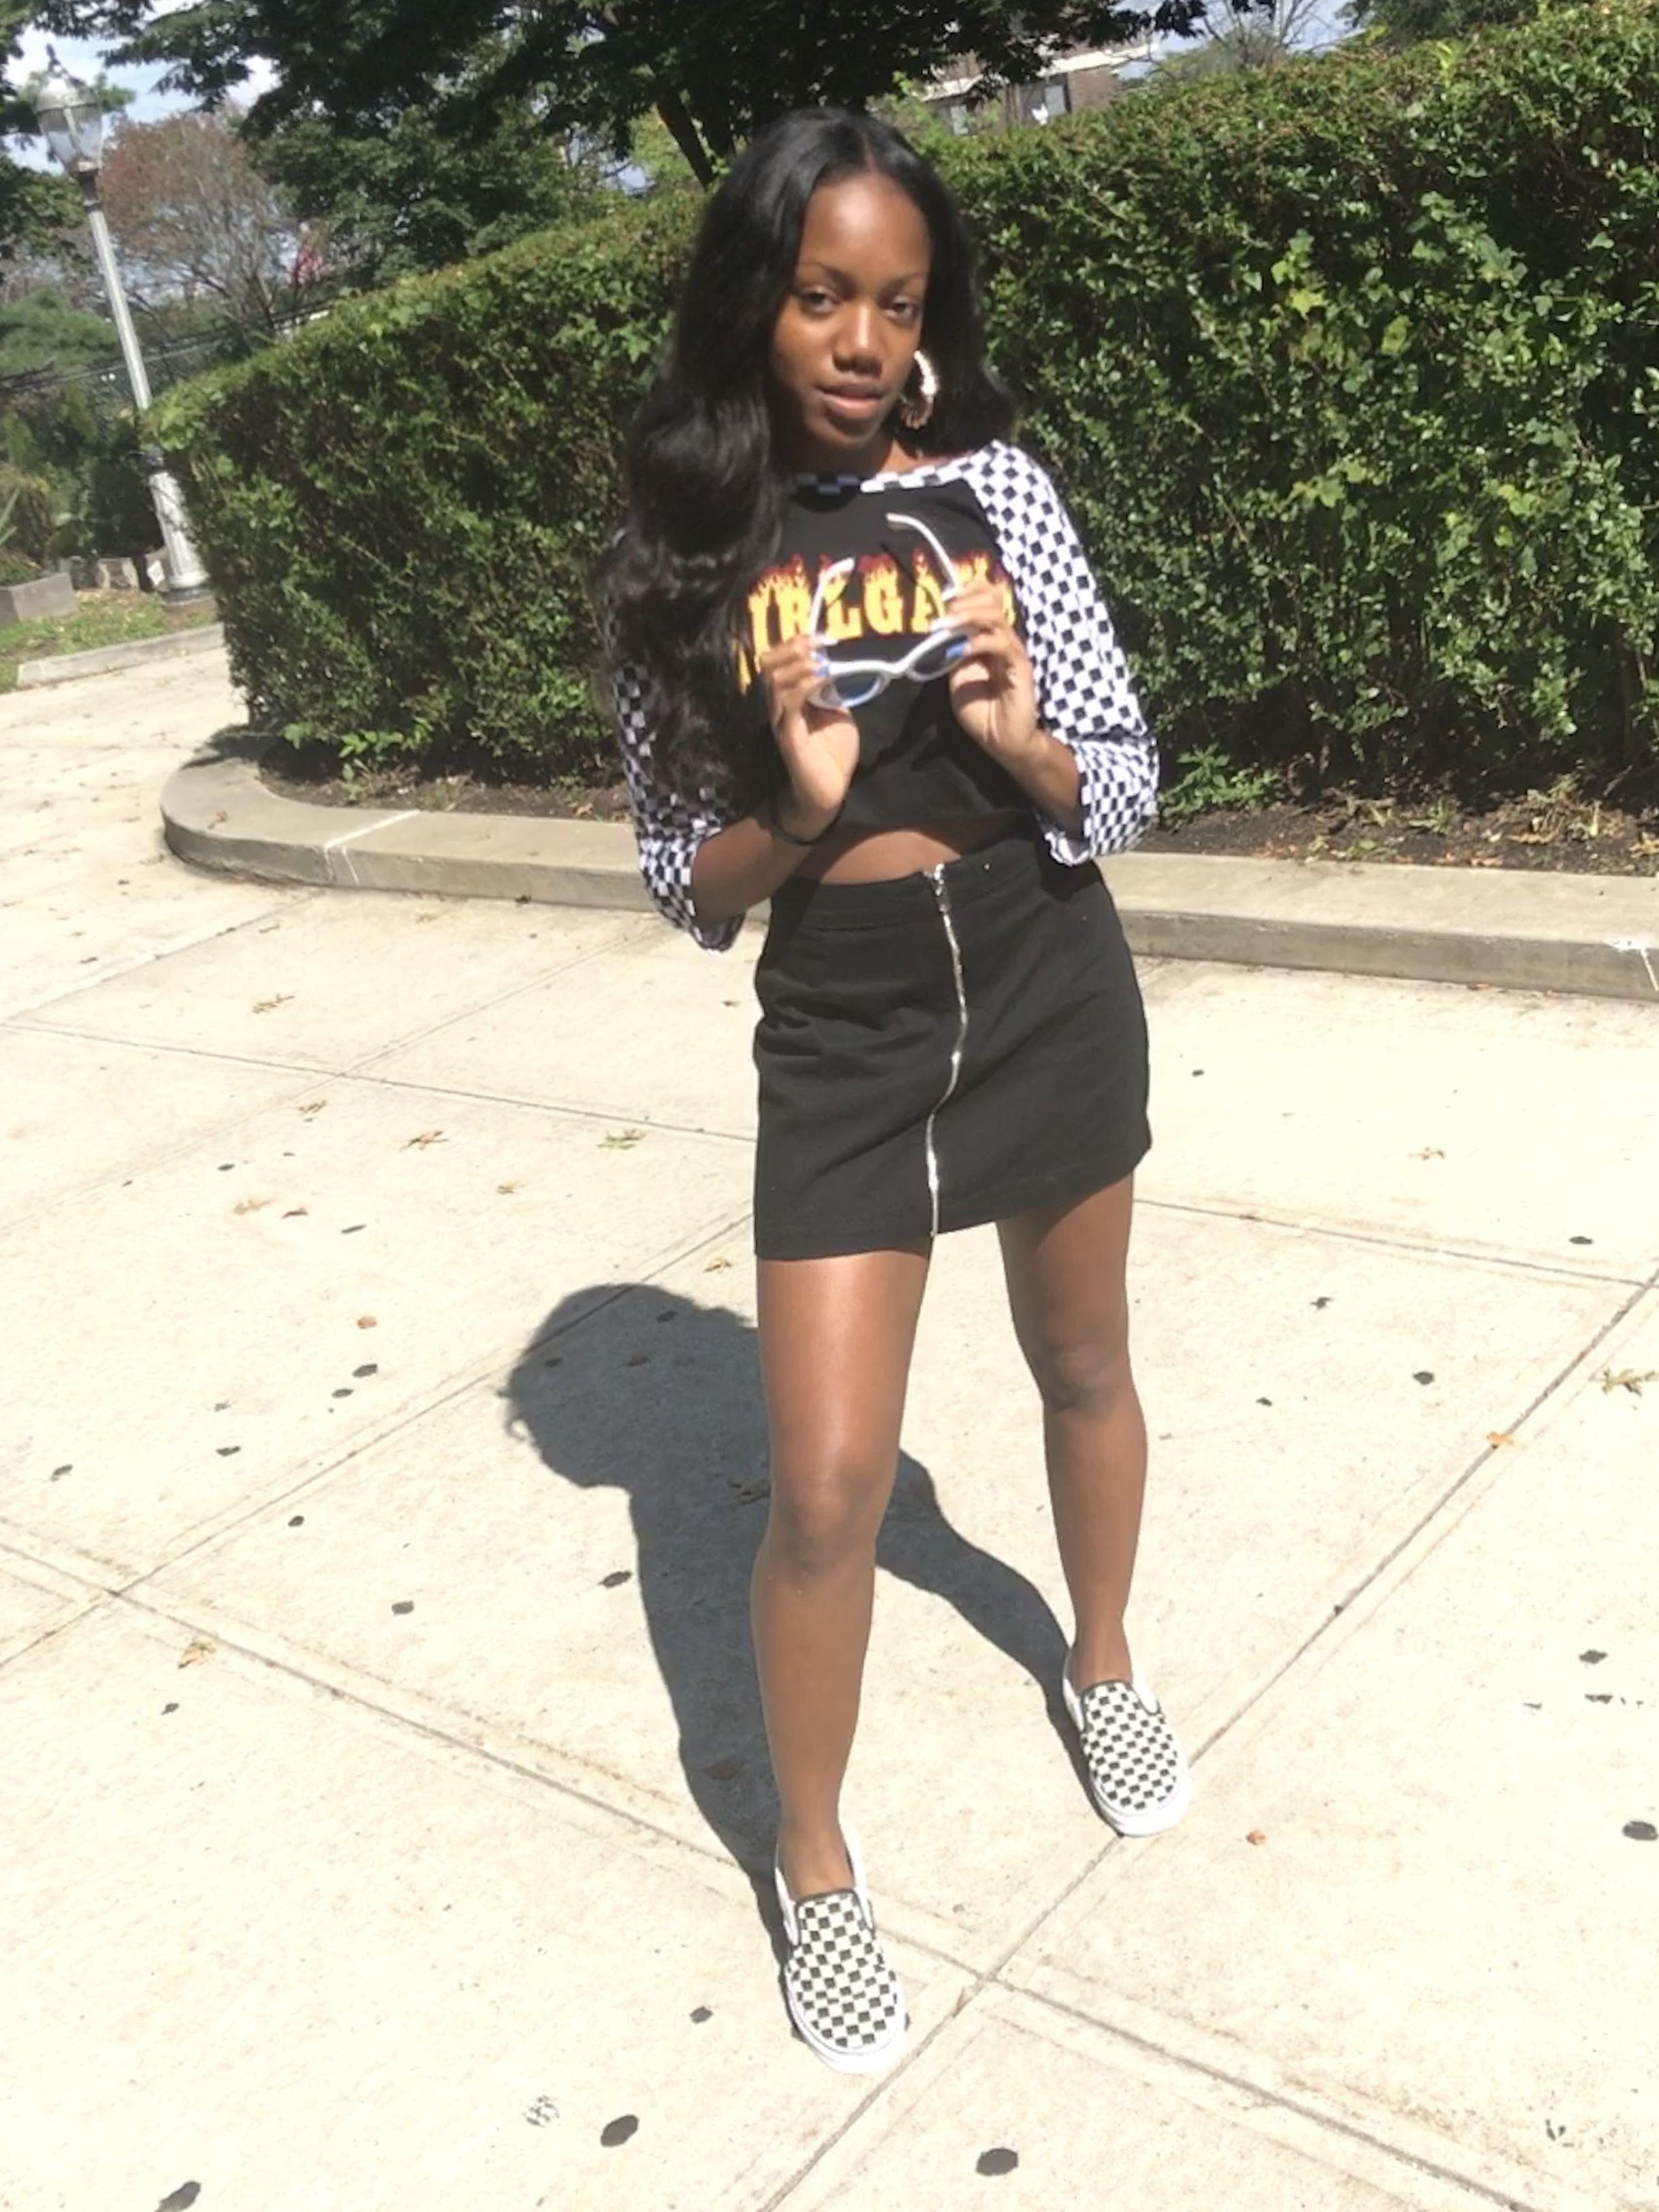 Checkered Board Vans Outfit Black Skirt Forever21 H M Girlgang Shirt Clout Glasses Black Mini Skirt Vans Outfit Diy Summer Clothes Black Skirt Outfits [ 3248 x 2436 Pixel ]